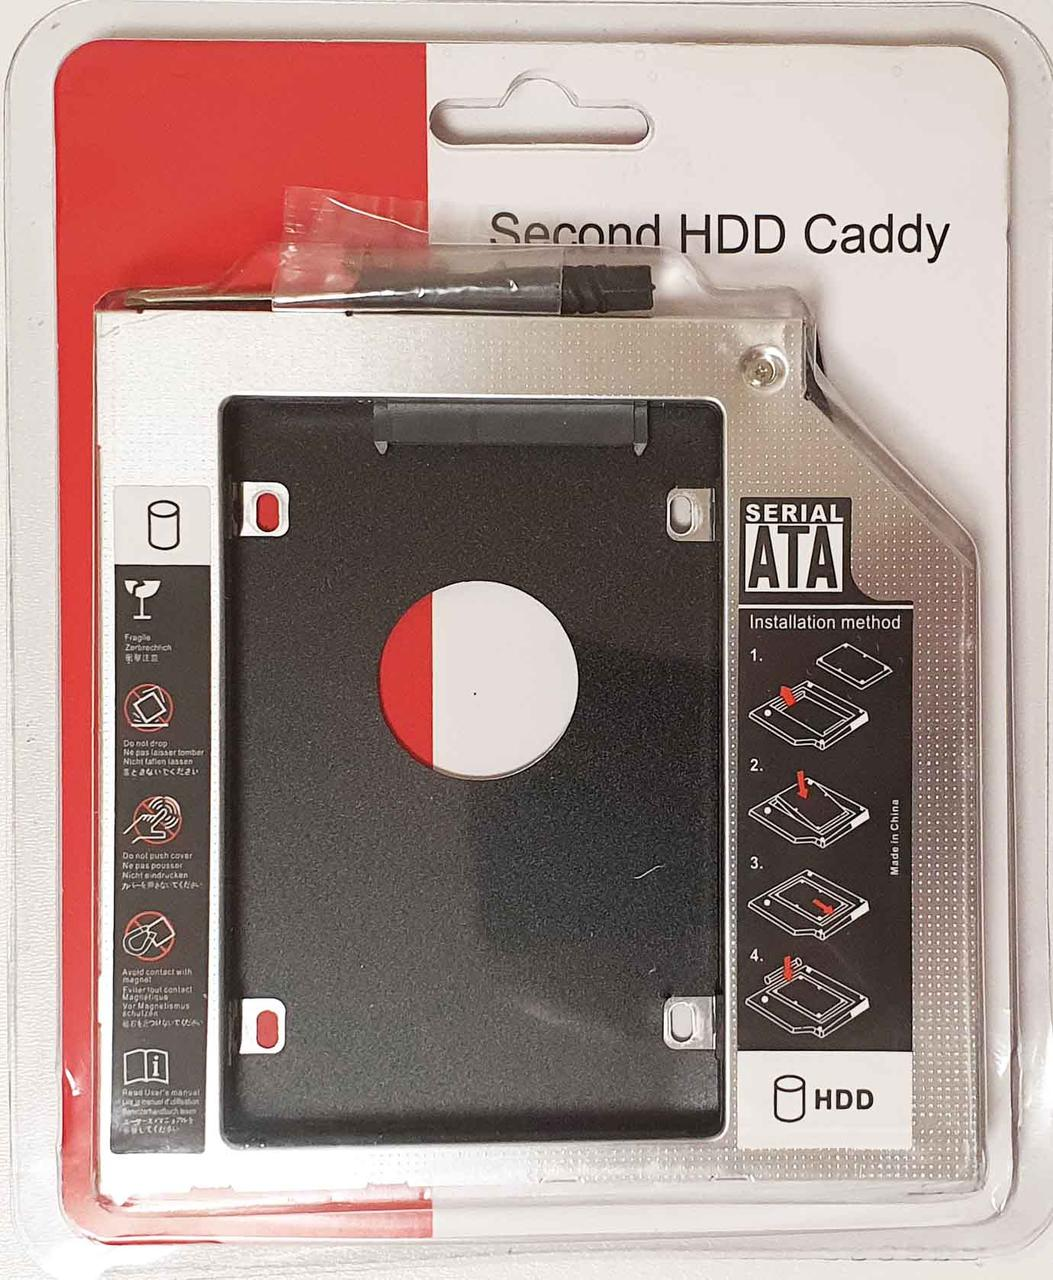 25 шт. Карман для установки второго жесткого диска SATA в отсек DVD 9.5 мм SATA (optibay caddy) алюминий